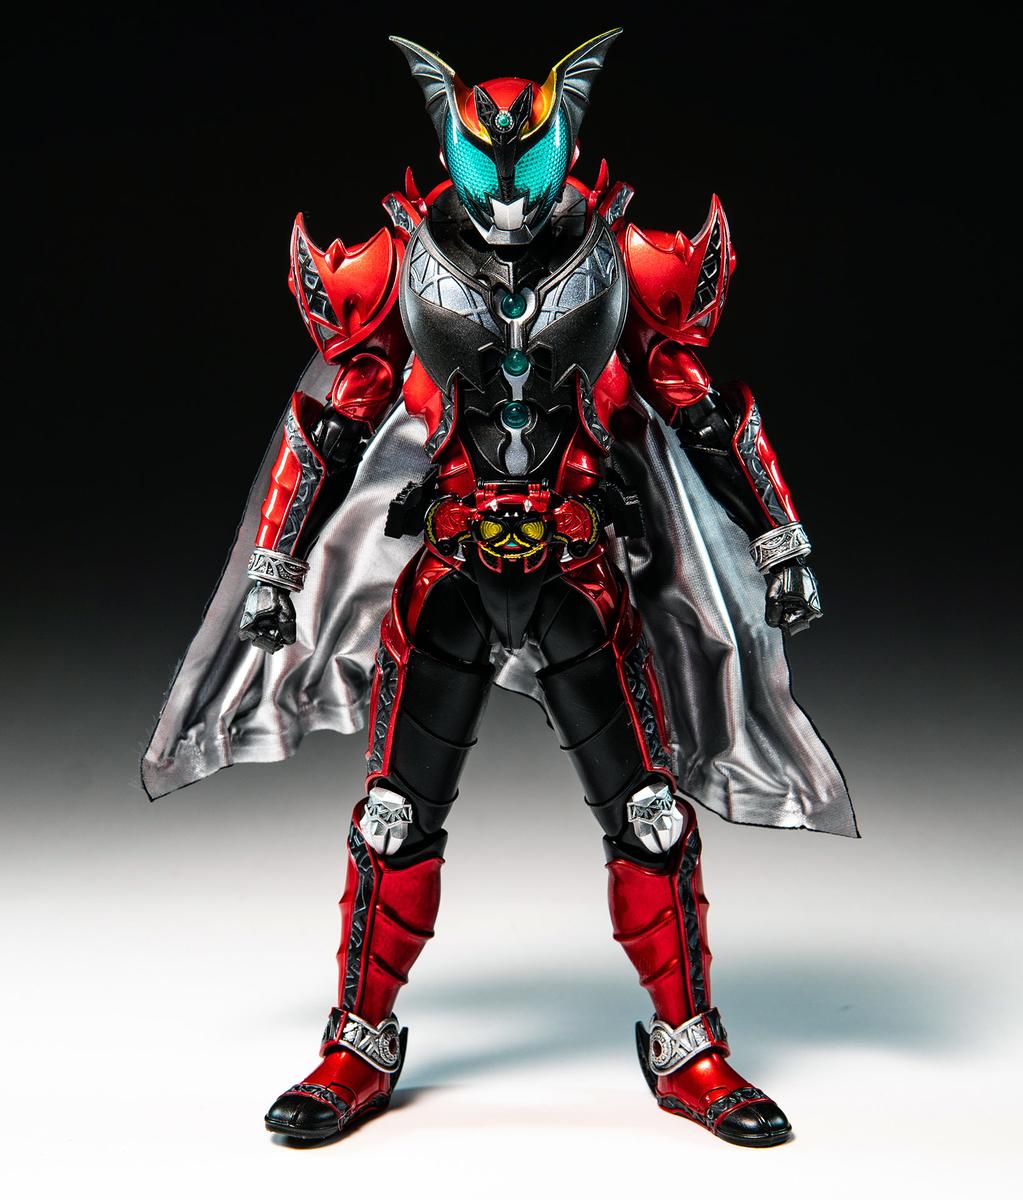 f:id:hiroban-ch:20211007010355j:plain